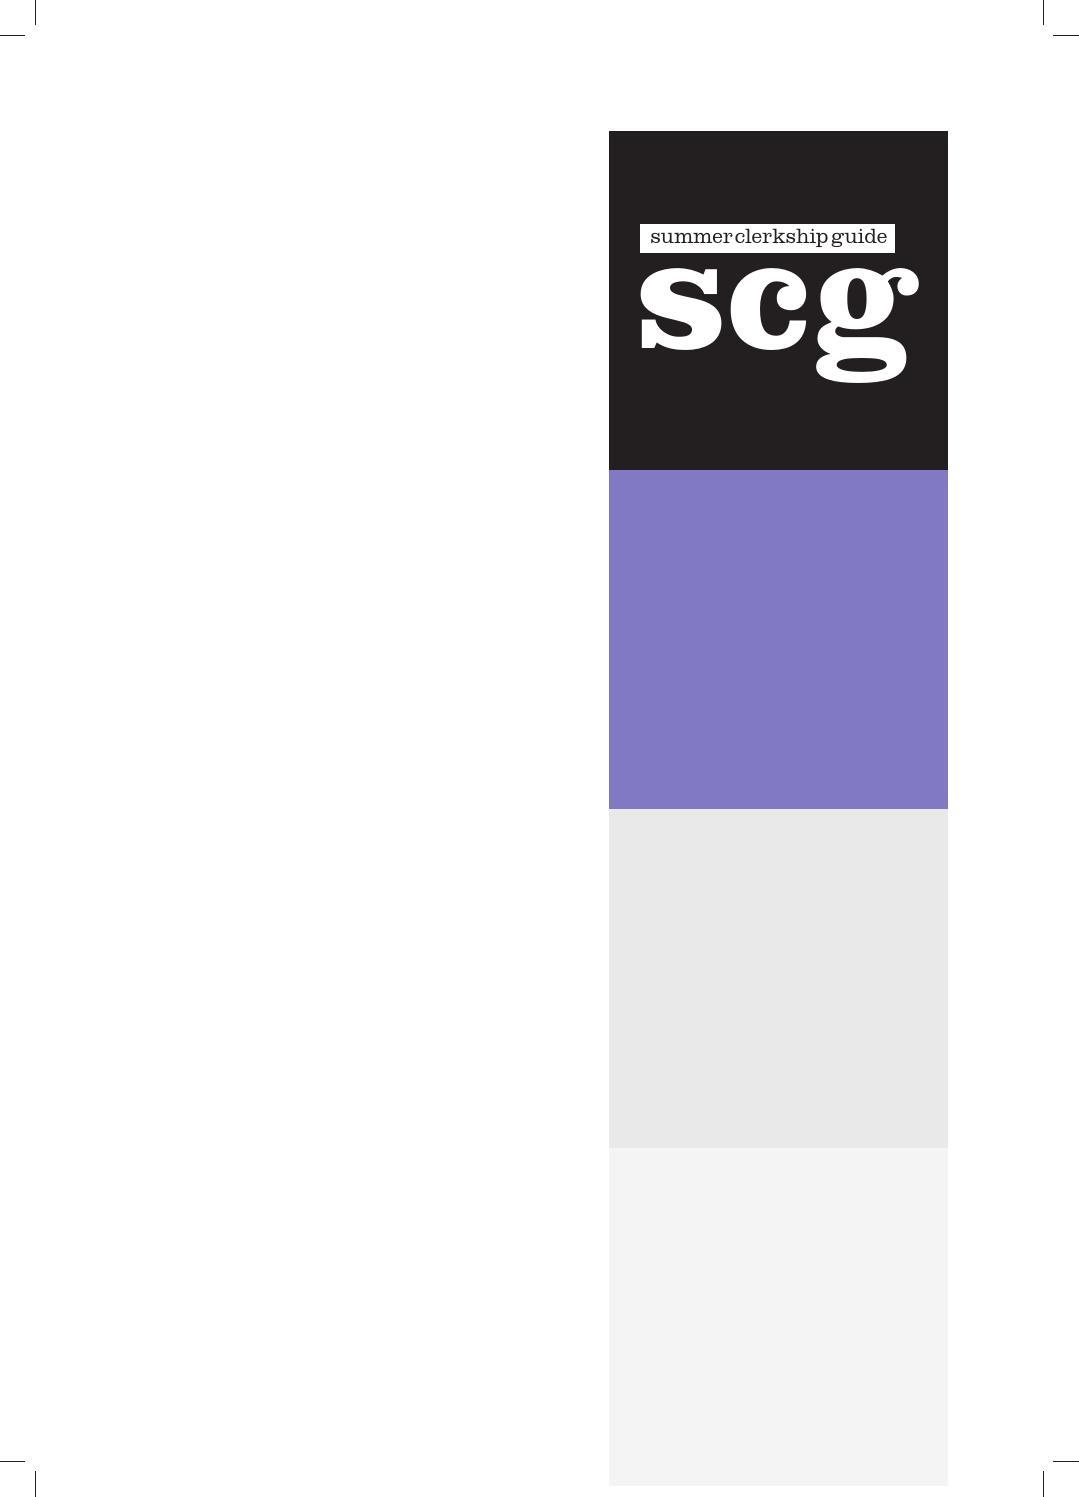 Clerkship Guide 2016 by Macquarie University